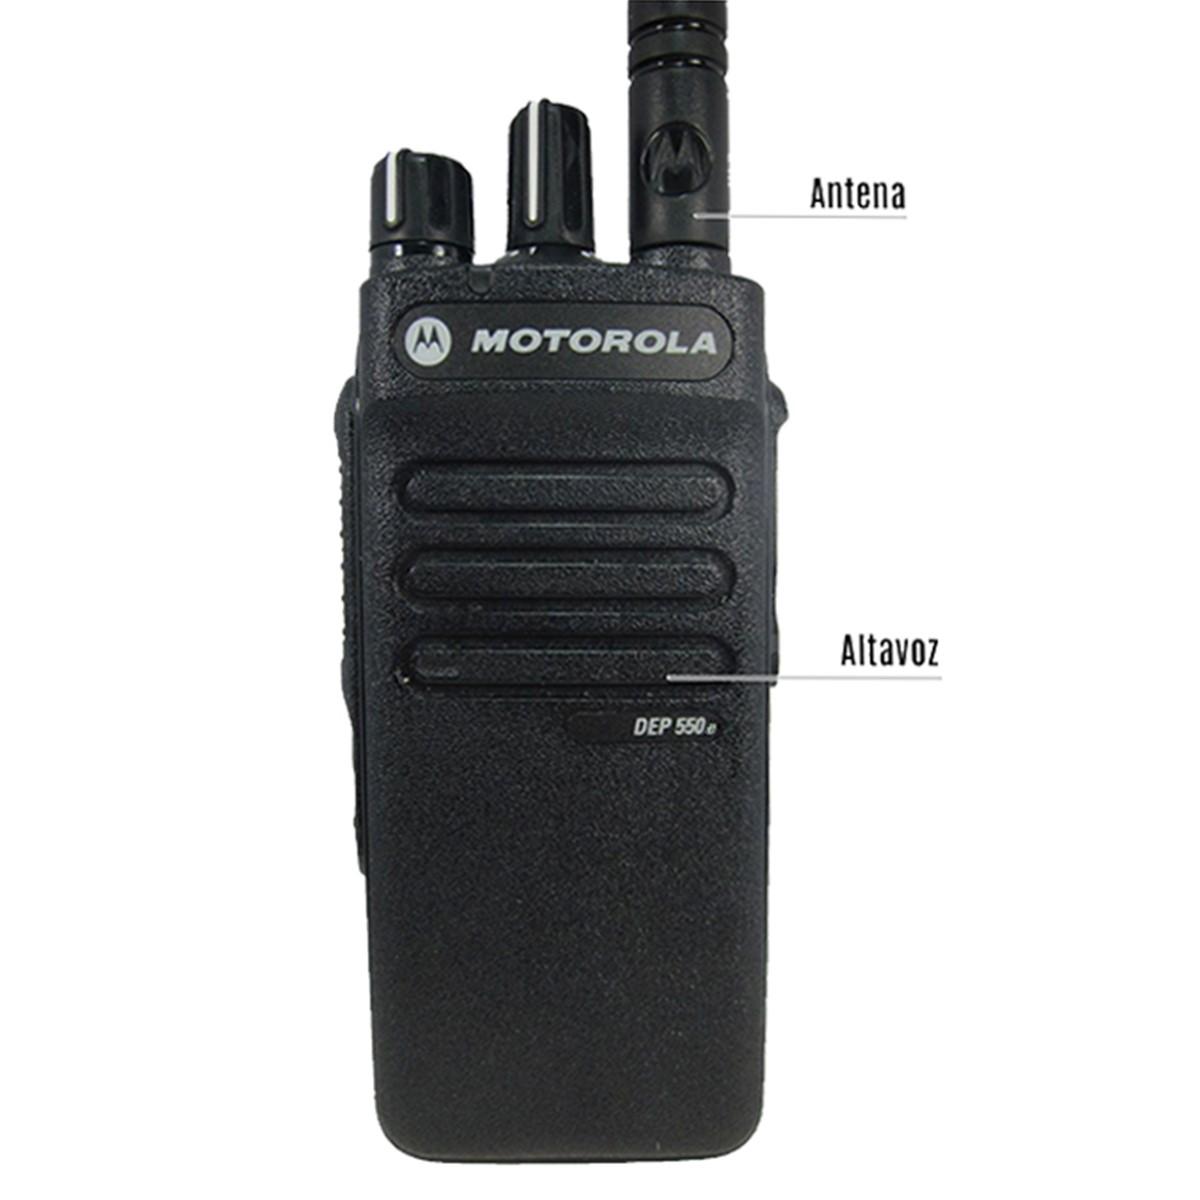 Radio Motorola DEP550e Digital LAH02RDC8UA1AN UHF 403-527 MHz